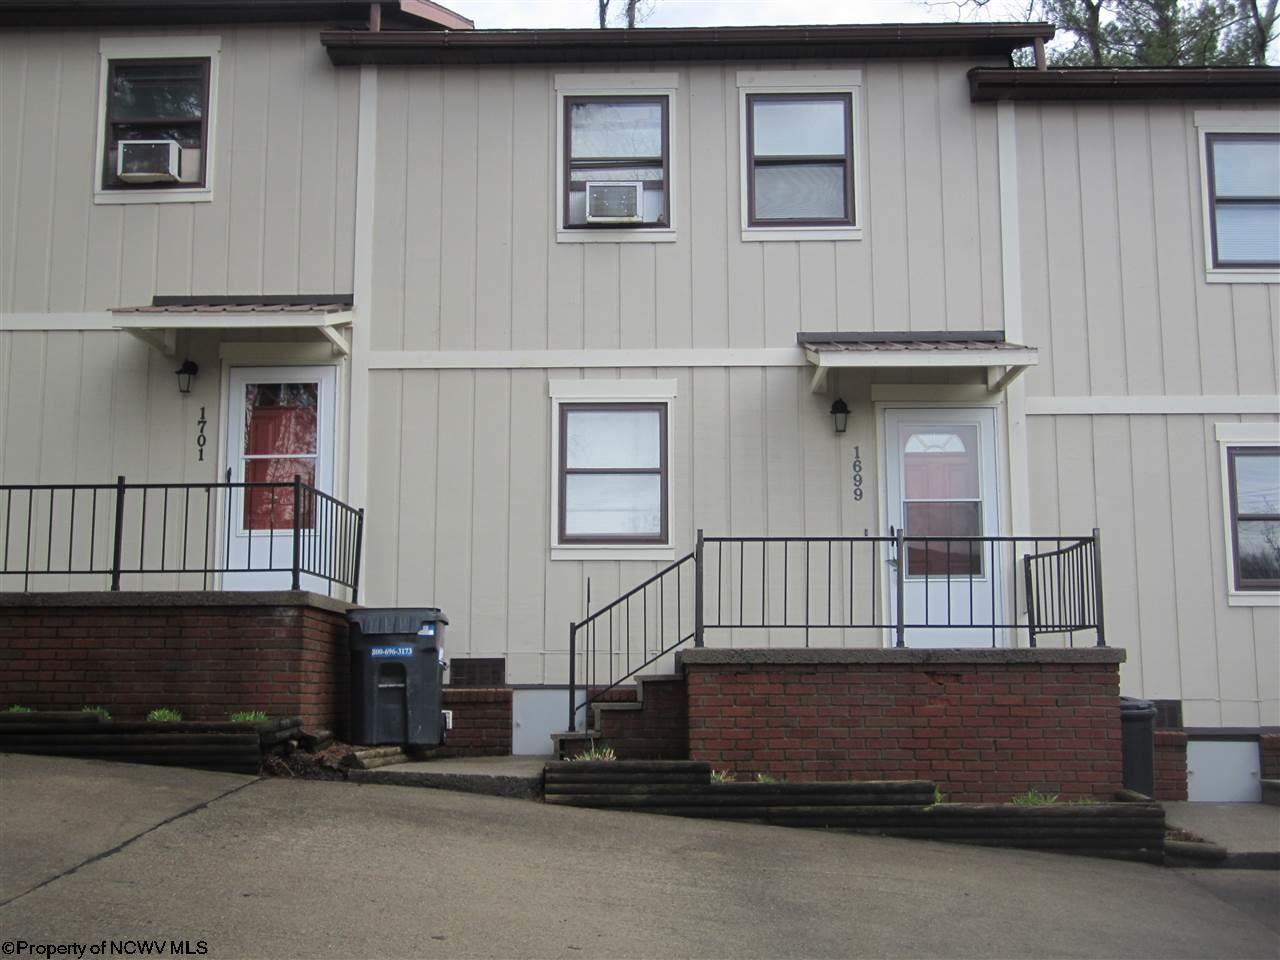 Photo for 1699 Van Voorhis Road, Morgantown, WV 26505 (MLS # 10131226)